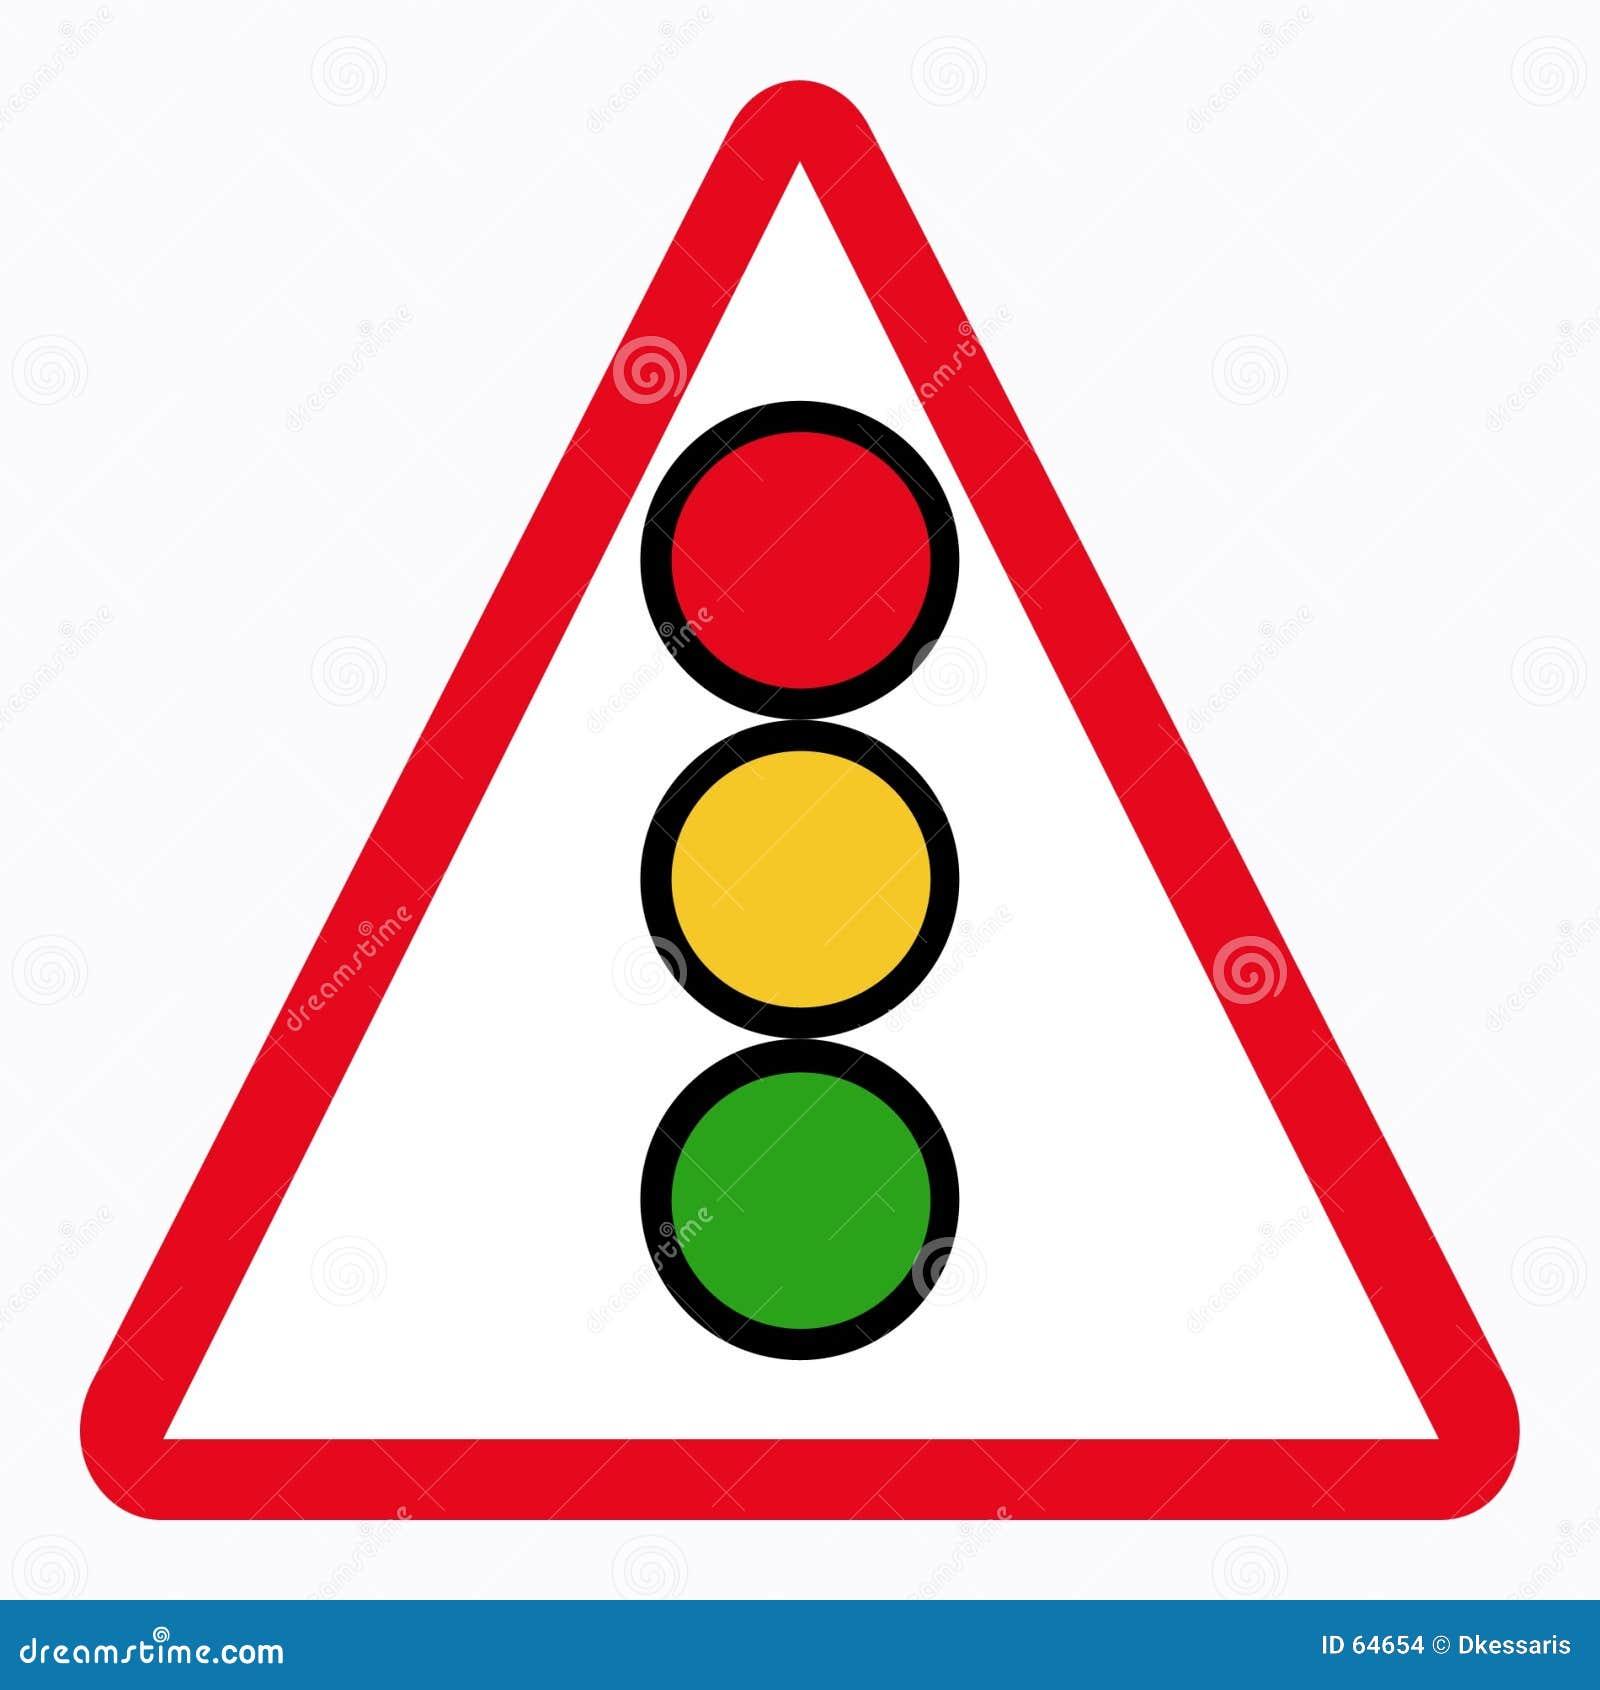 Sign traffic